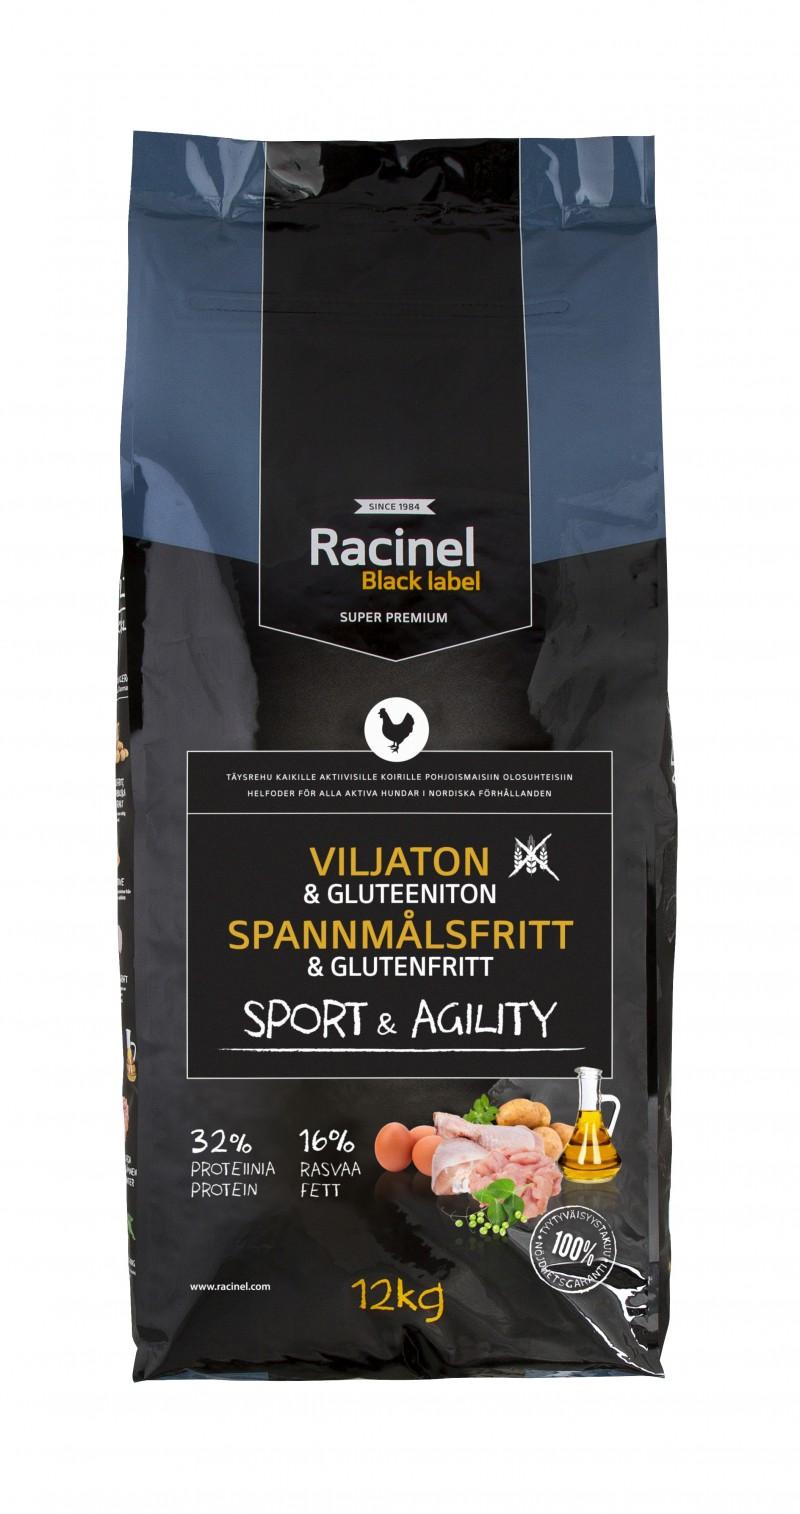 Racinel Black Label Sport&Agility, 12kg